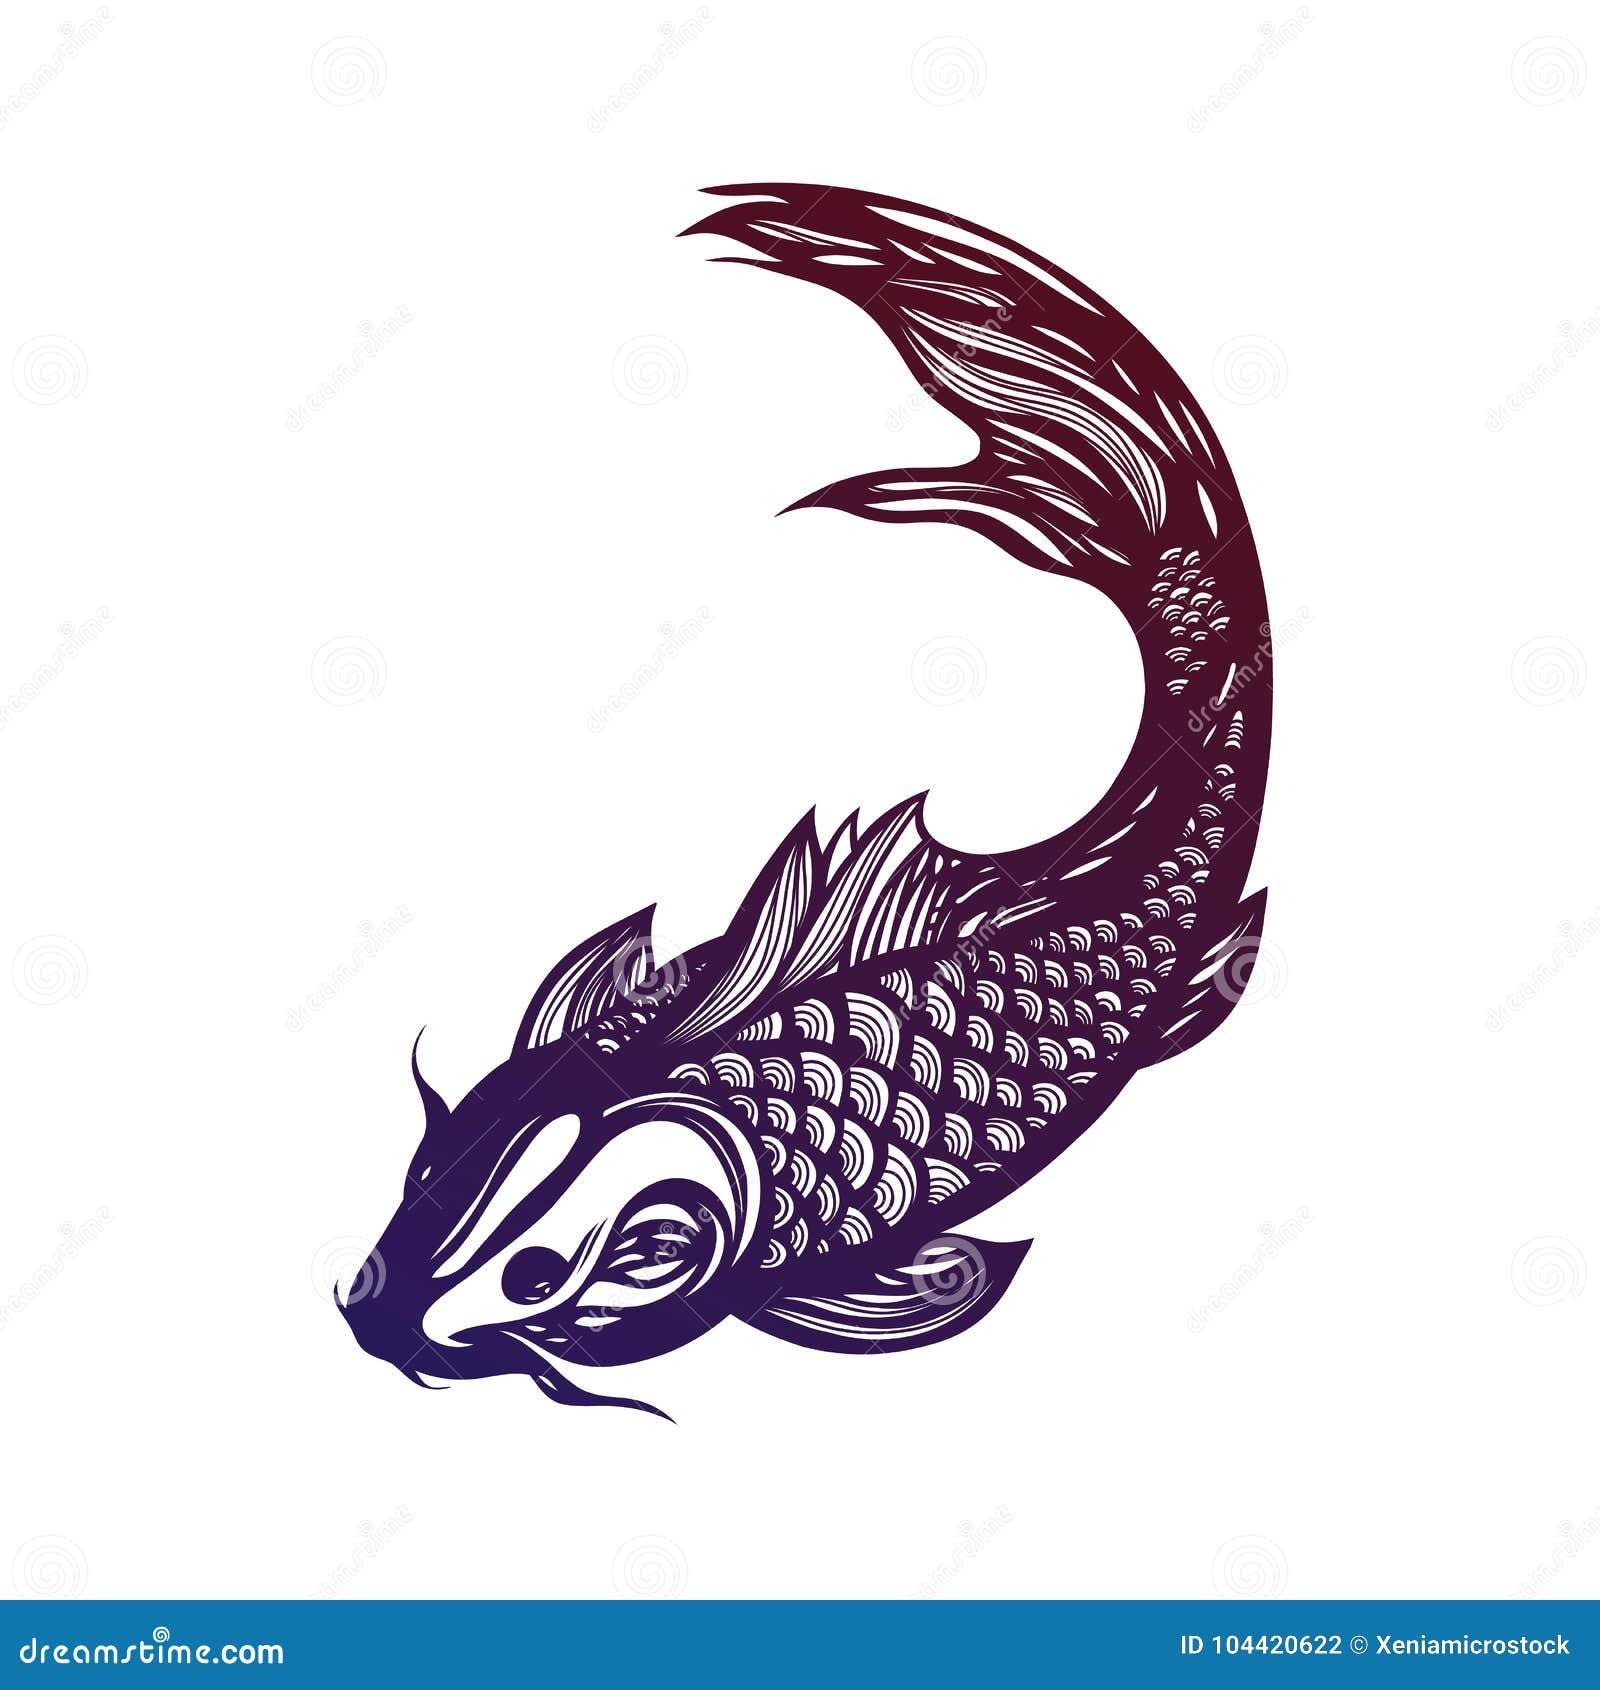 Fish koi carp chinese symbol of good luck courage persistence chinese symbol of good luck courage persistence perseverance wisdom and vitality asia mystic biocorpaavc